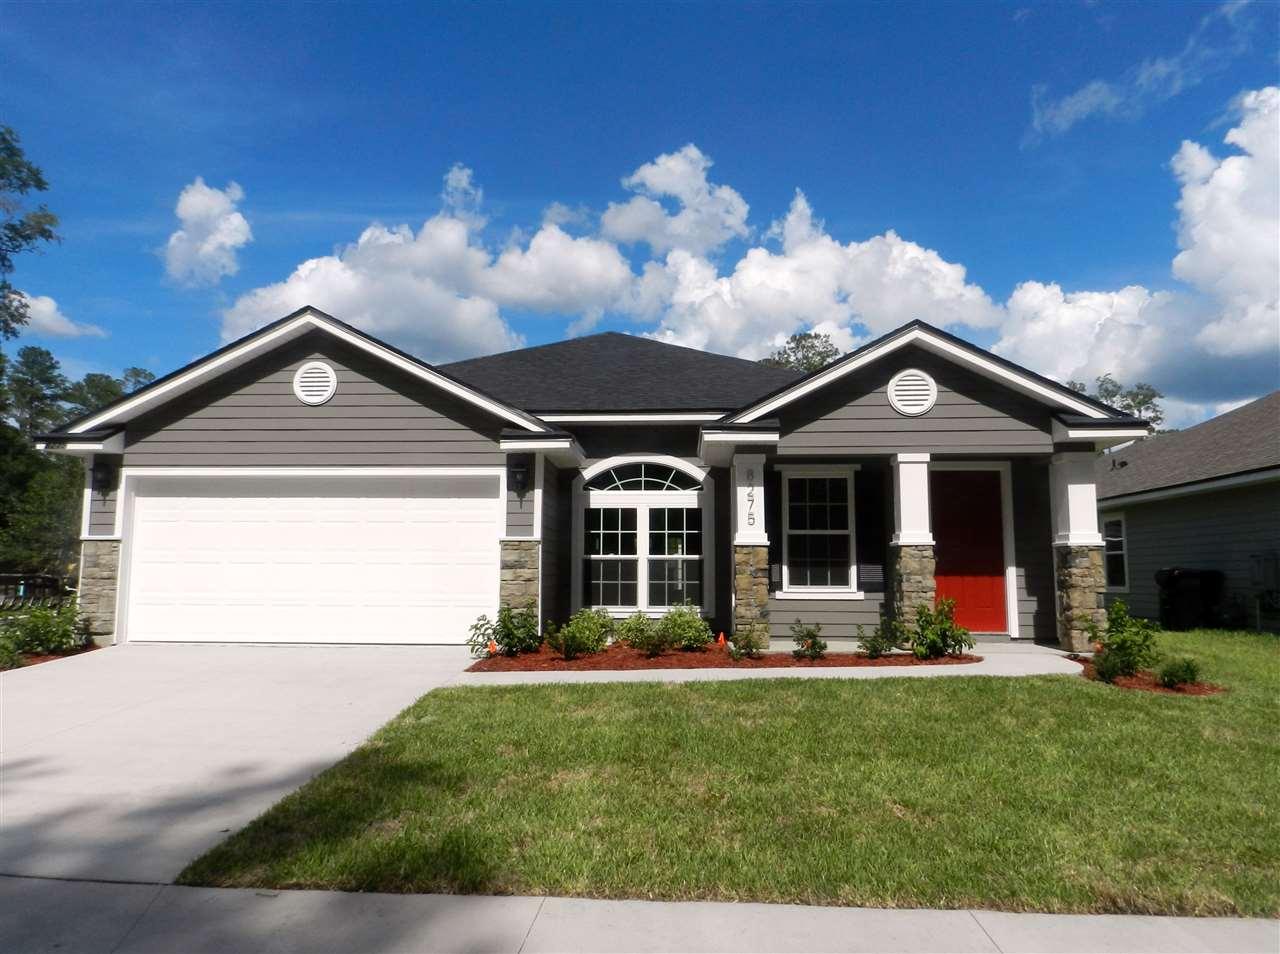 8326 Nw 54th St, Gainesville, FL 32653